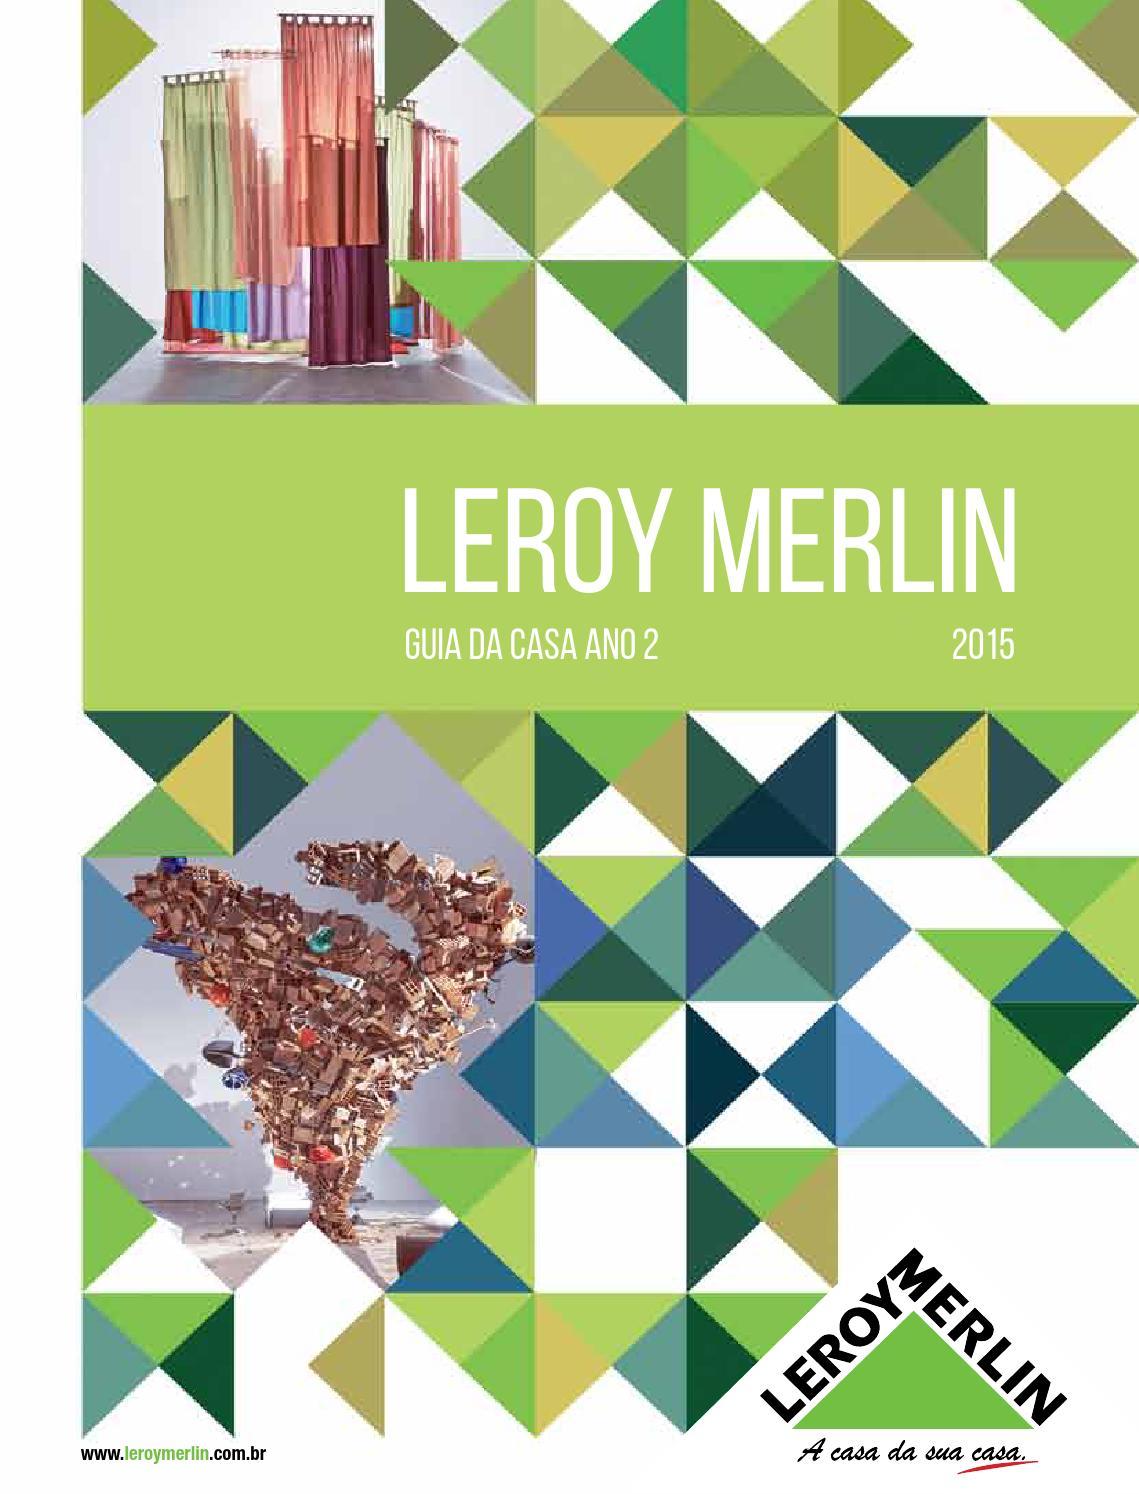 Guia da casa leroy merlin 2015 by arte target issuu for Guia pasacables leroy merlin